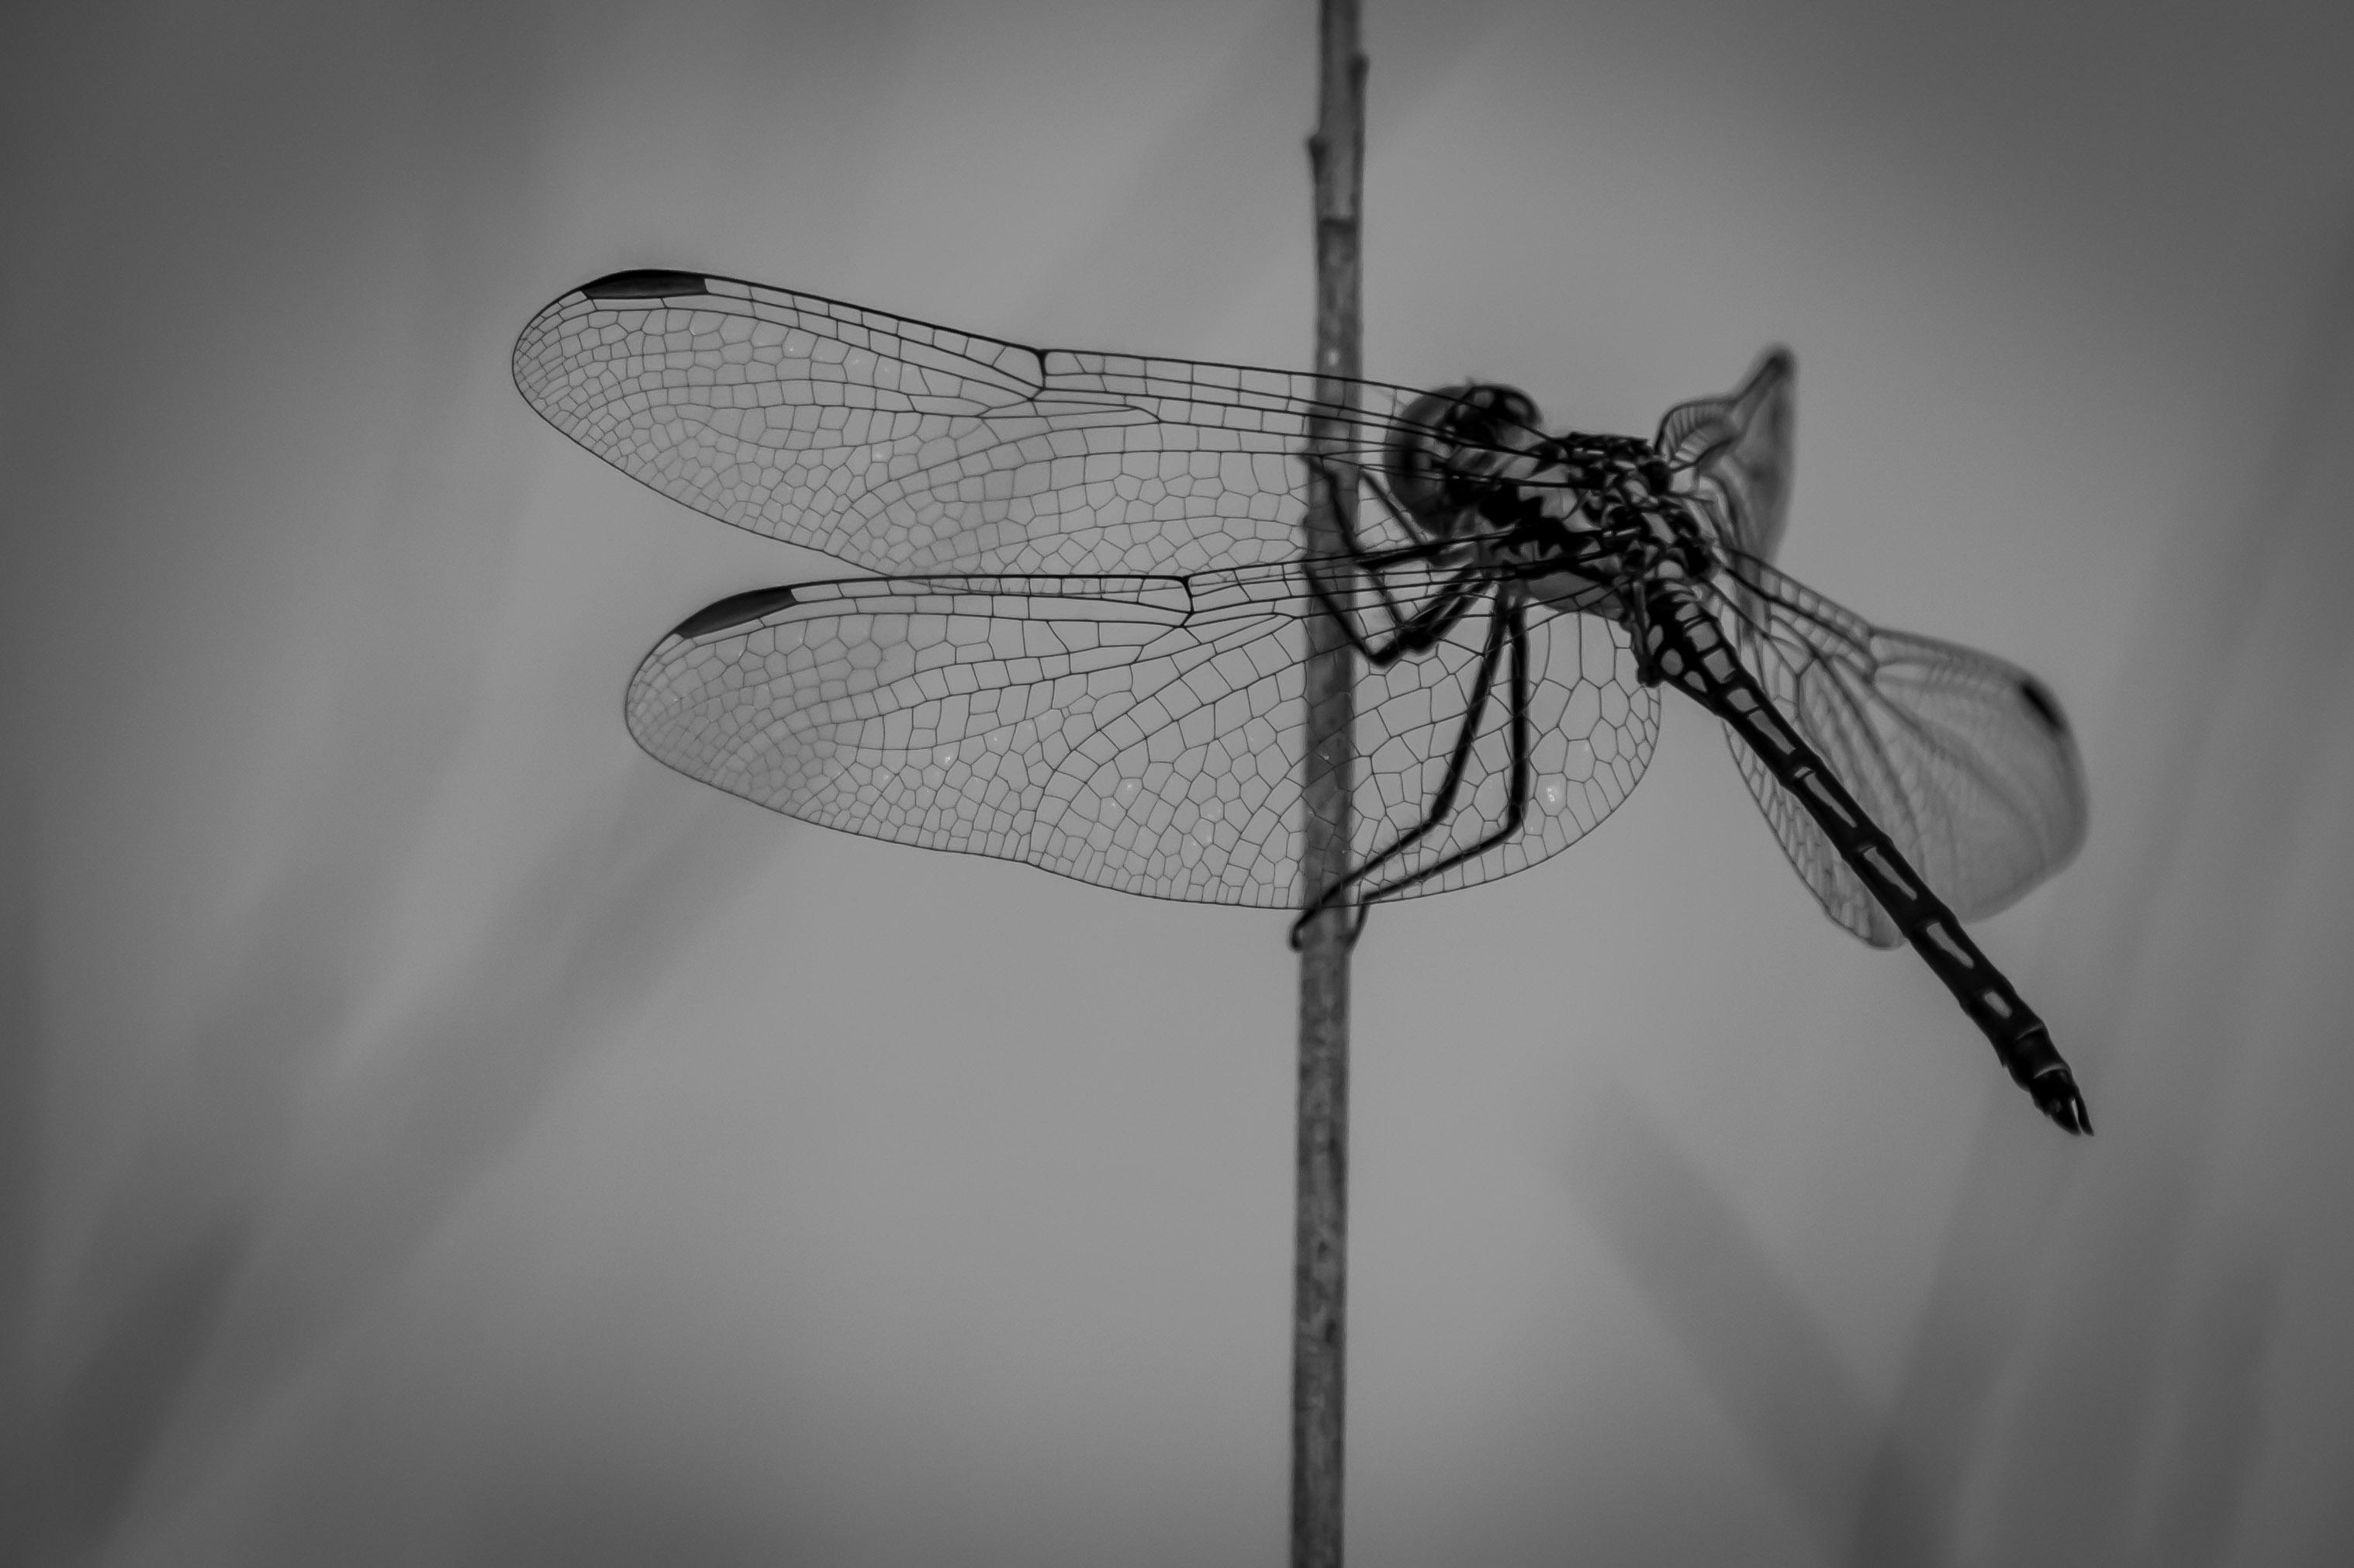 dragon-fly-photo